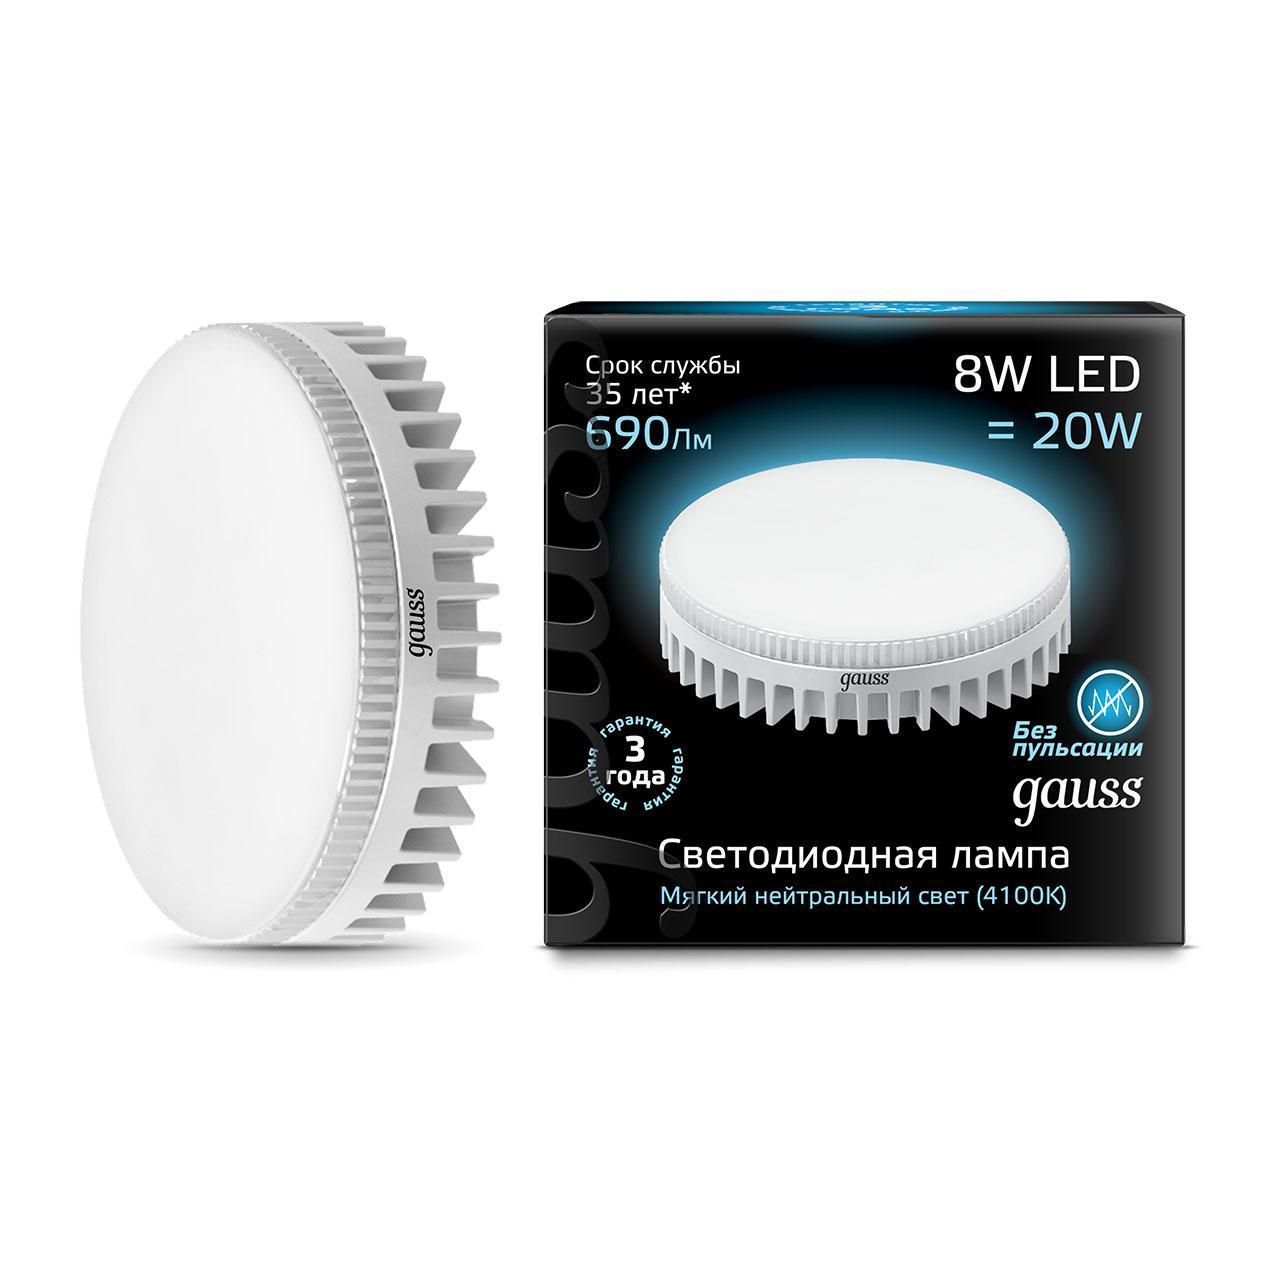 Лампа светодиодная GX53 8W 4100K матовая 108008208 gauss black led gx53 8w 4100k 108008208